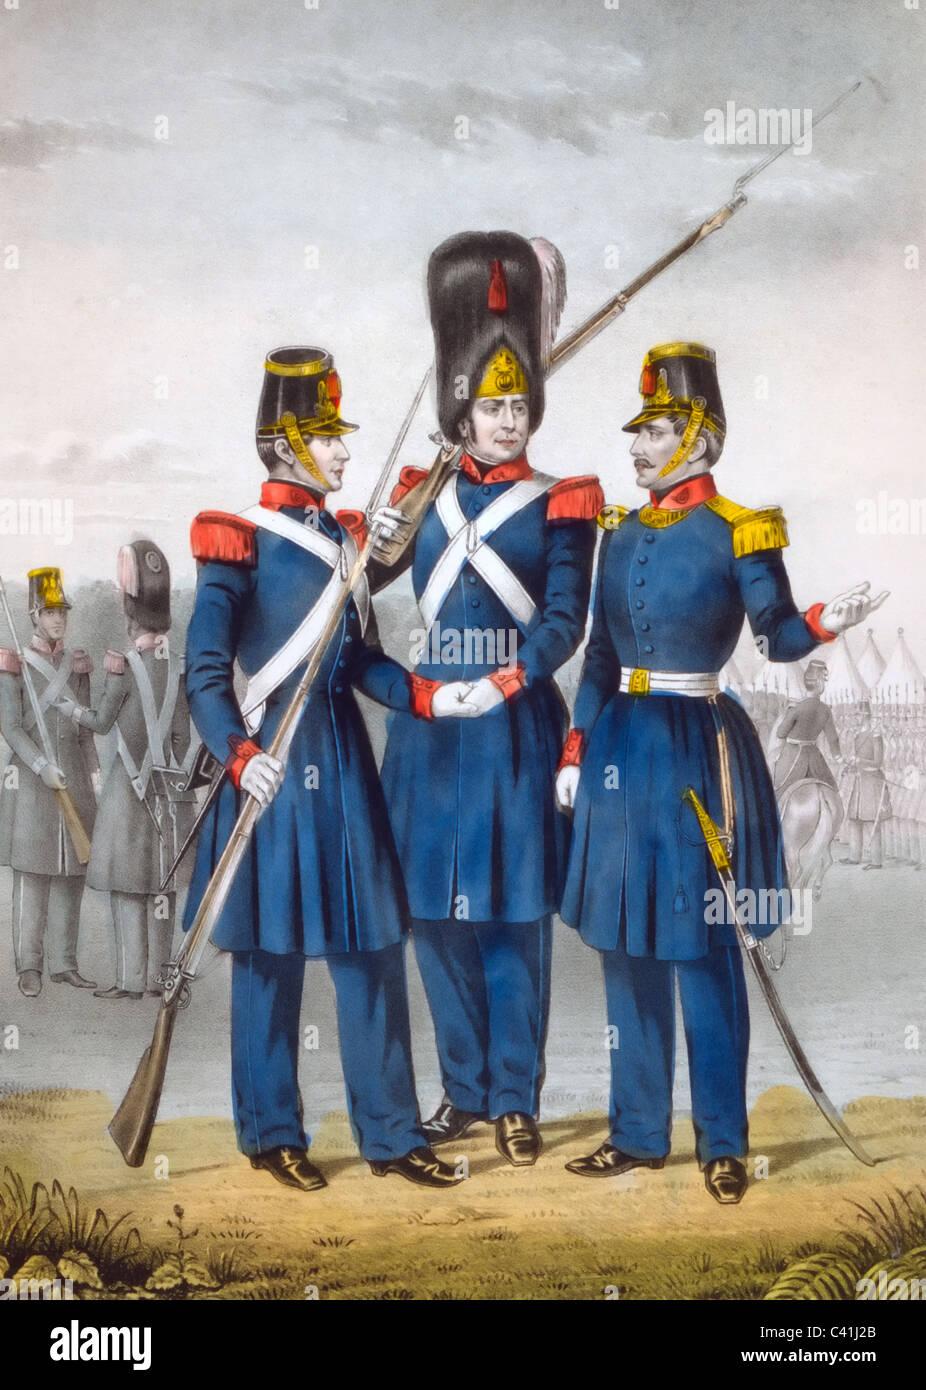 California guard - Print showing men in dress uniform, circa 1846 - Stock Image